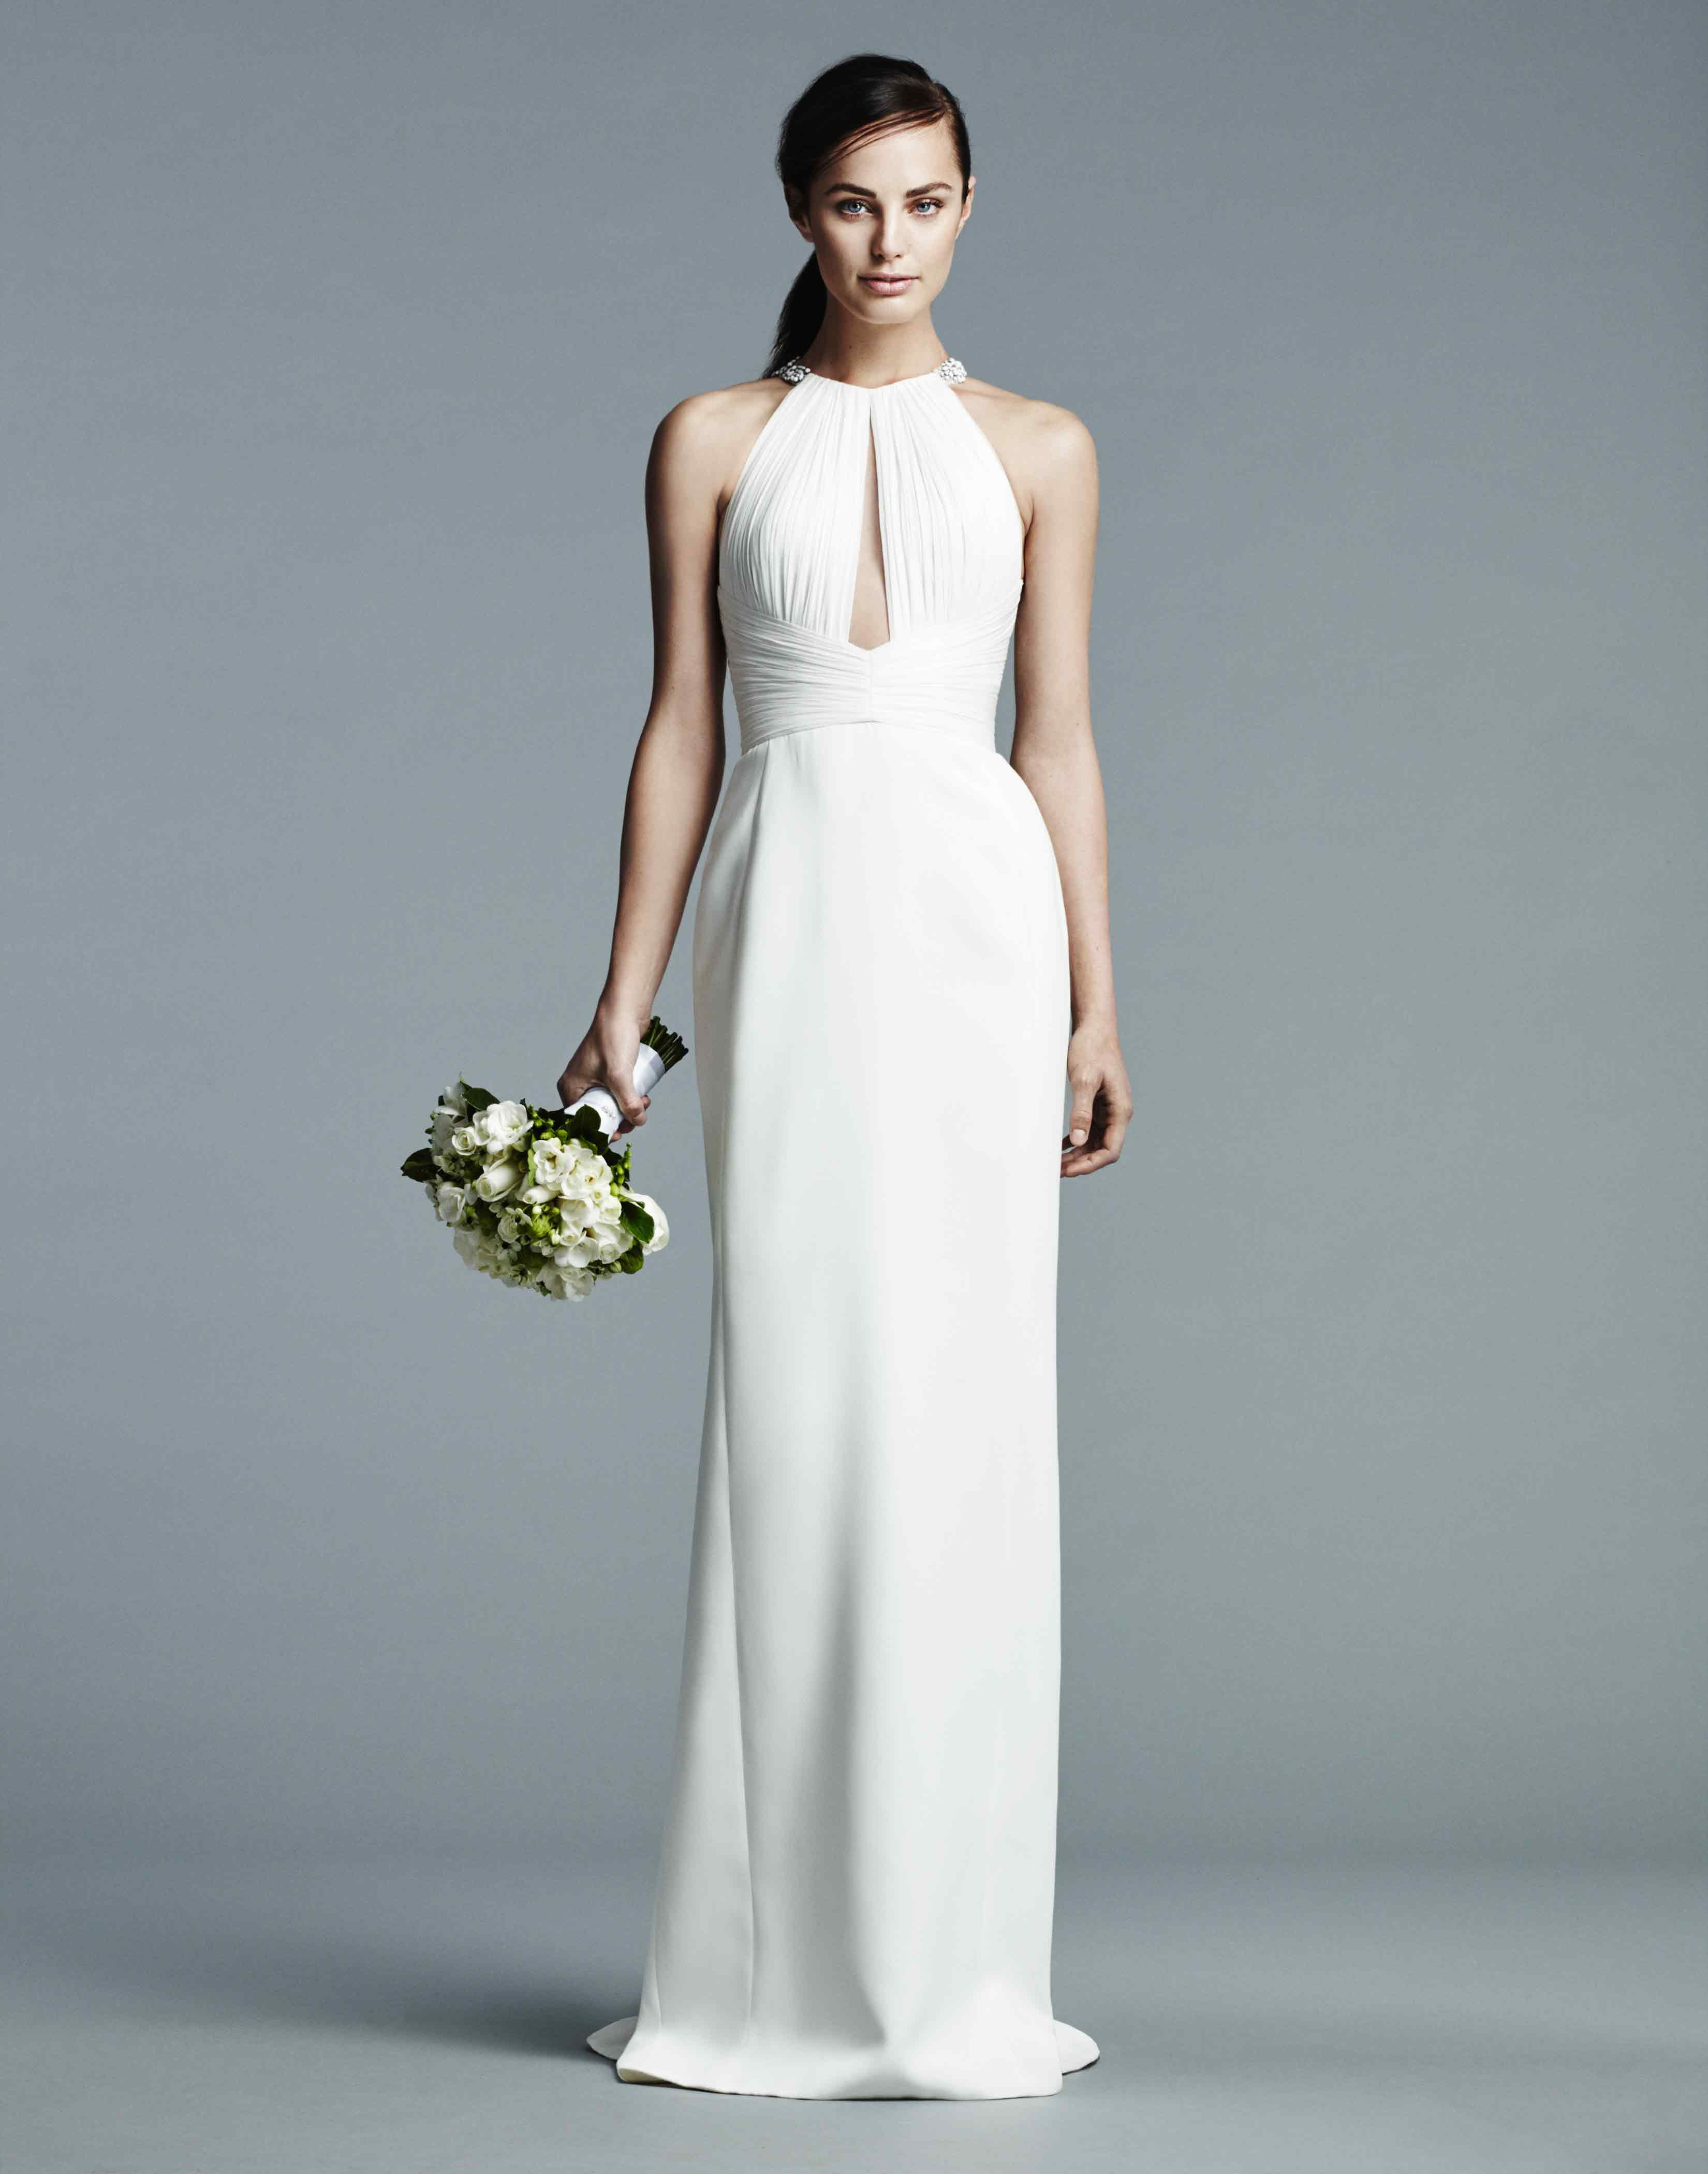 Spring bridal collection wedding dresses pinterest bridal